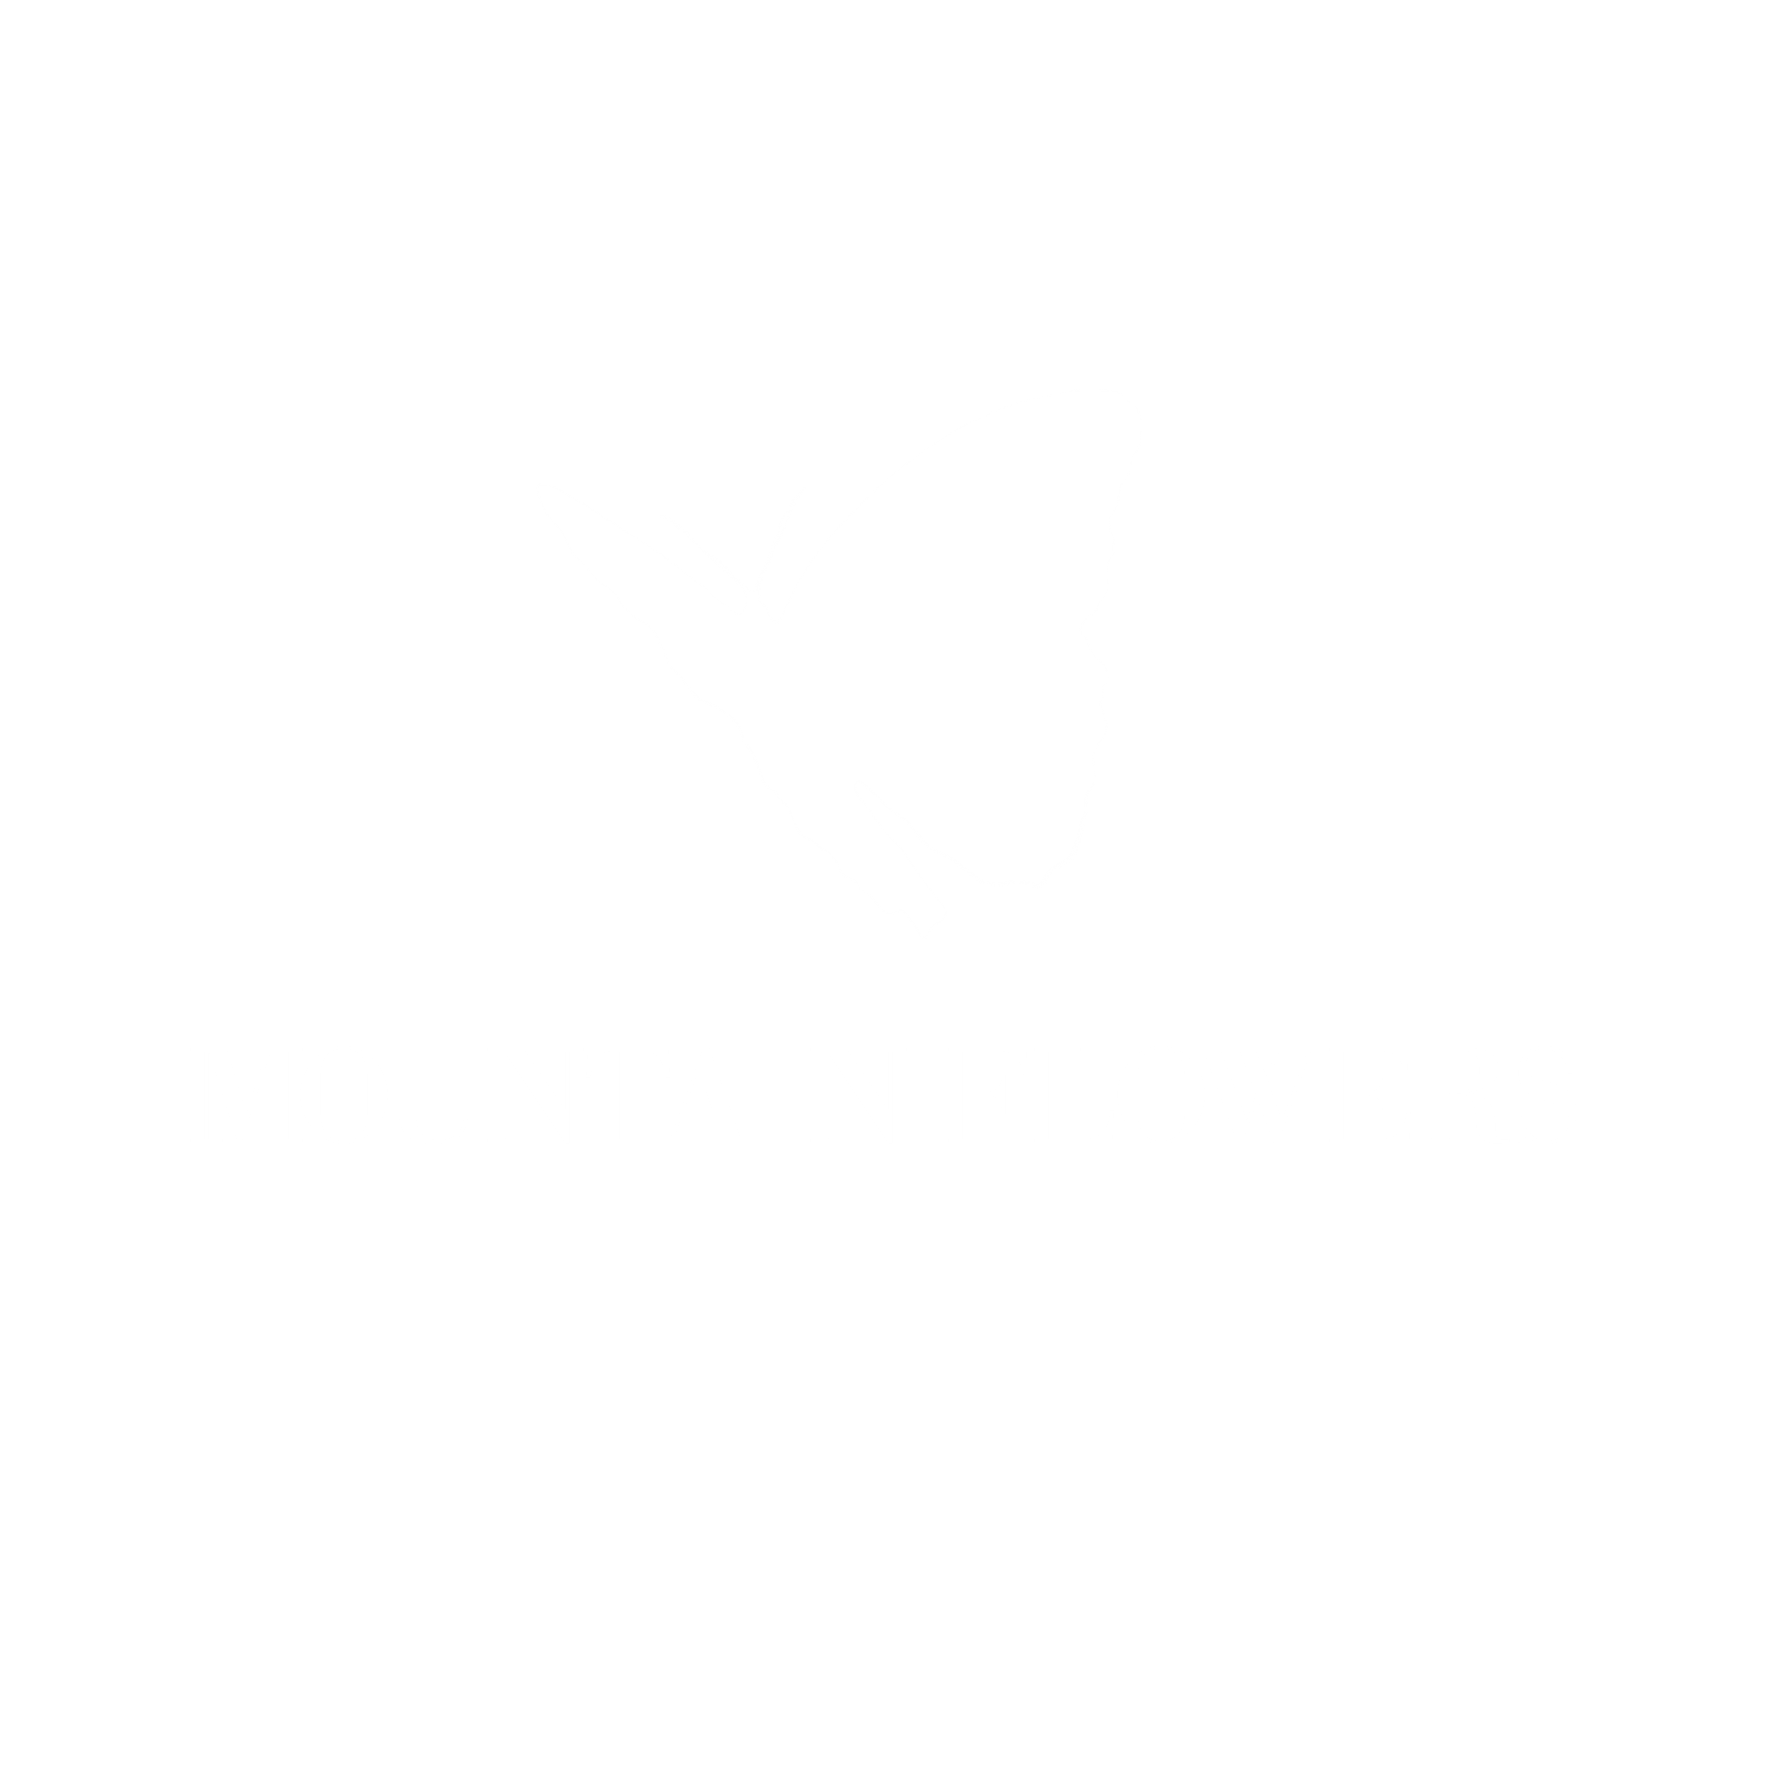 Mountain Valley Flowers of Aspen